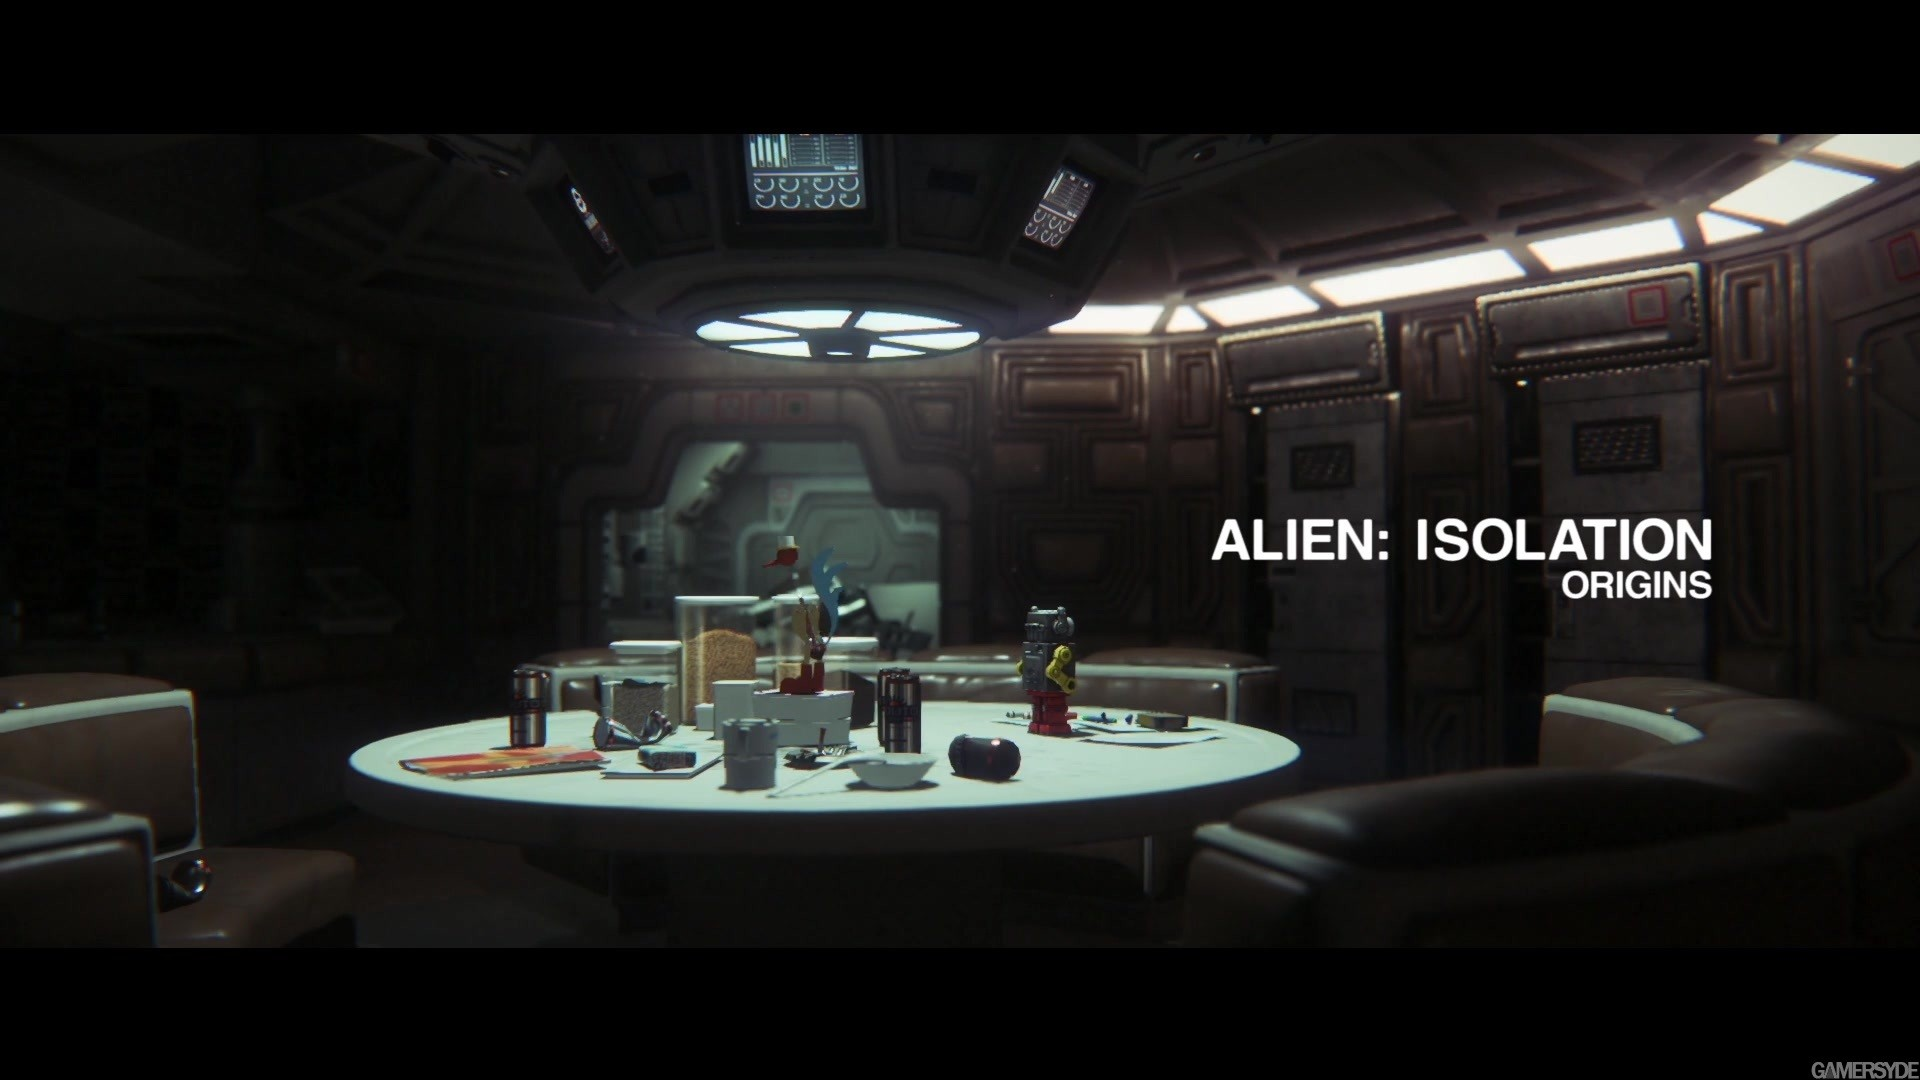 image_alien_isolation-23986-2866_0003